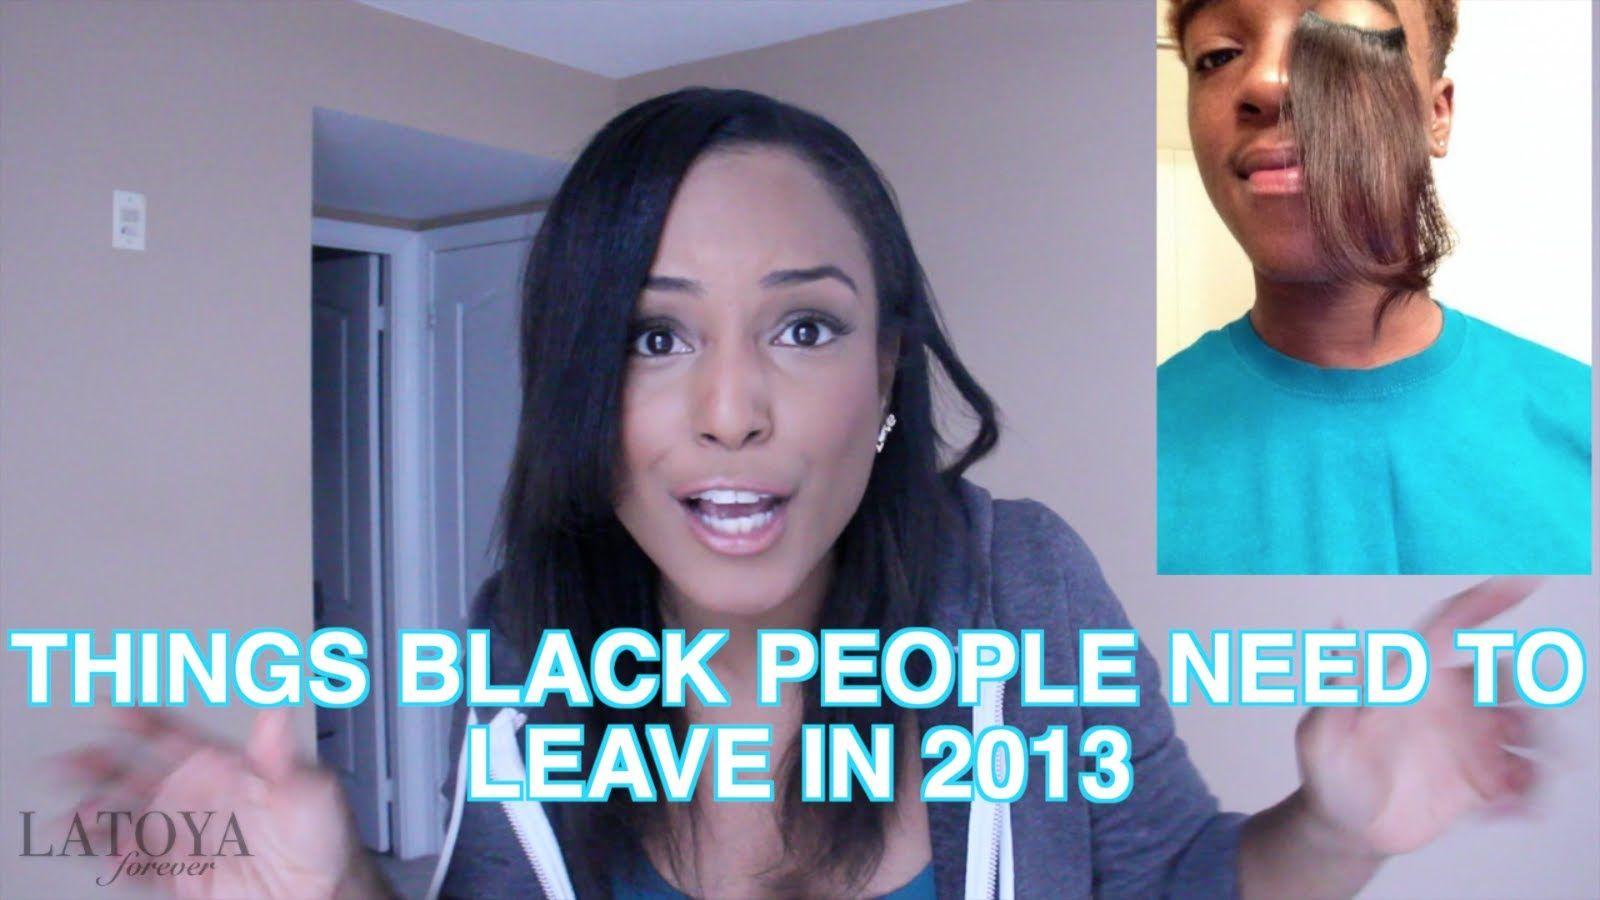 THINGS BLACK PEOPLE NEED TO LEAVE IN 2013